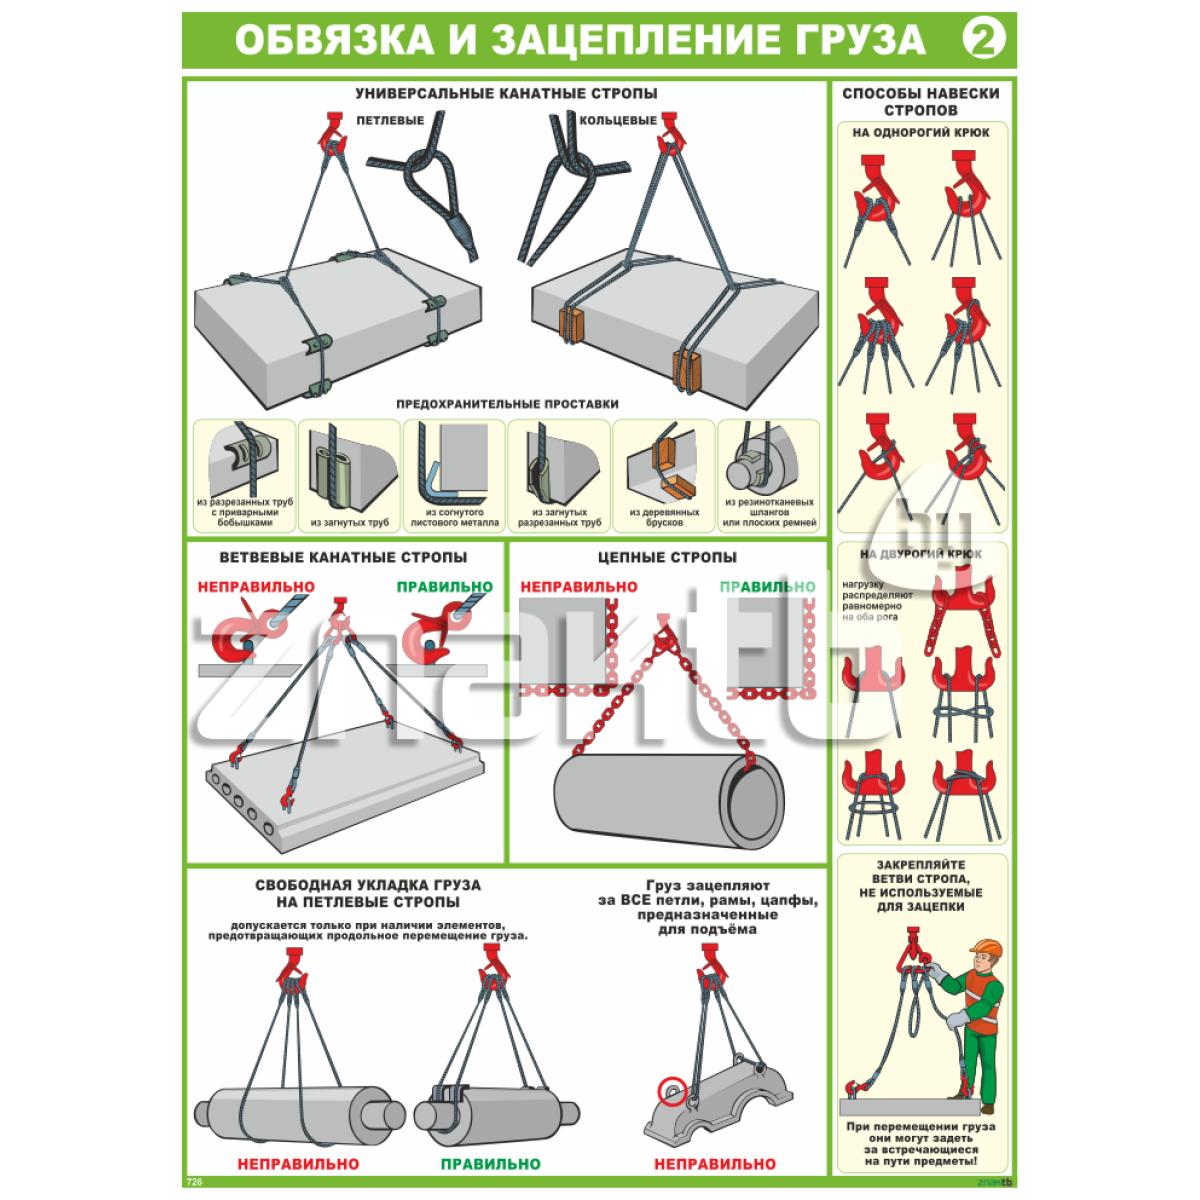 Плакат по охране труда Обвязка и зацепление груза